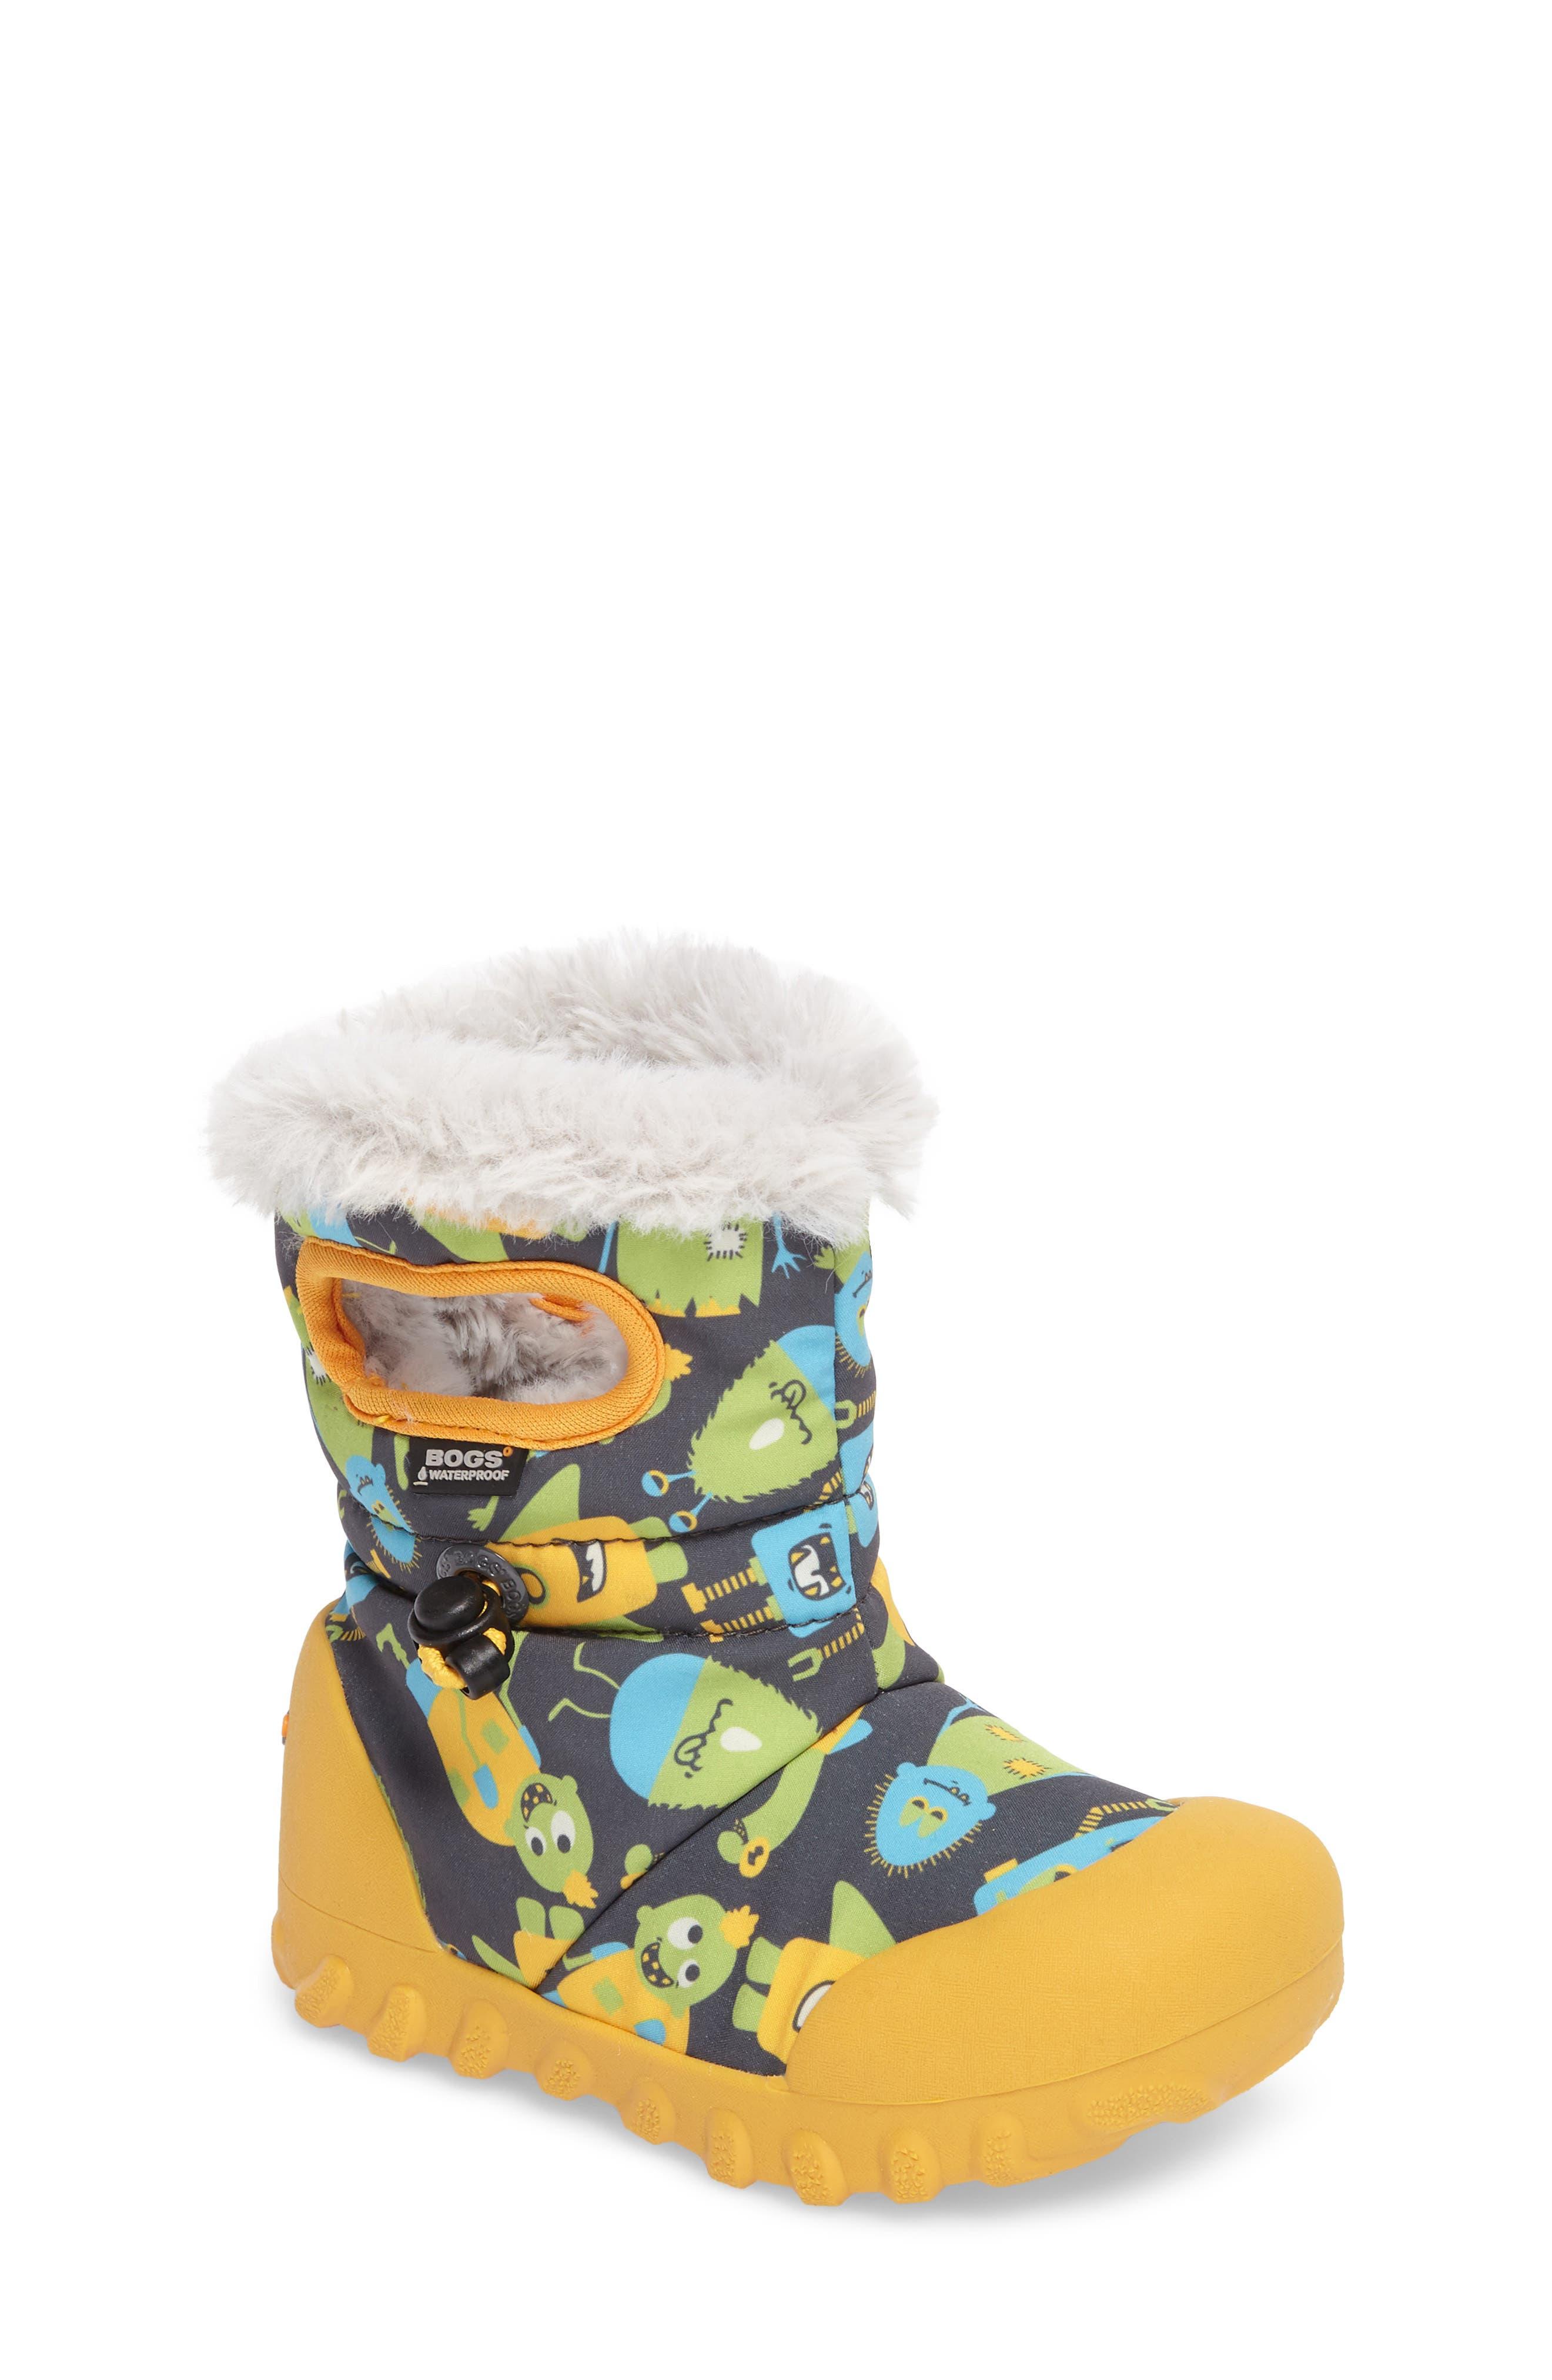 B-MOC Monsters Waterproof Insulated Faux Fur Winter Boot,                             Main thumbnail 1, color,                             Dark Gray Multi